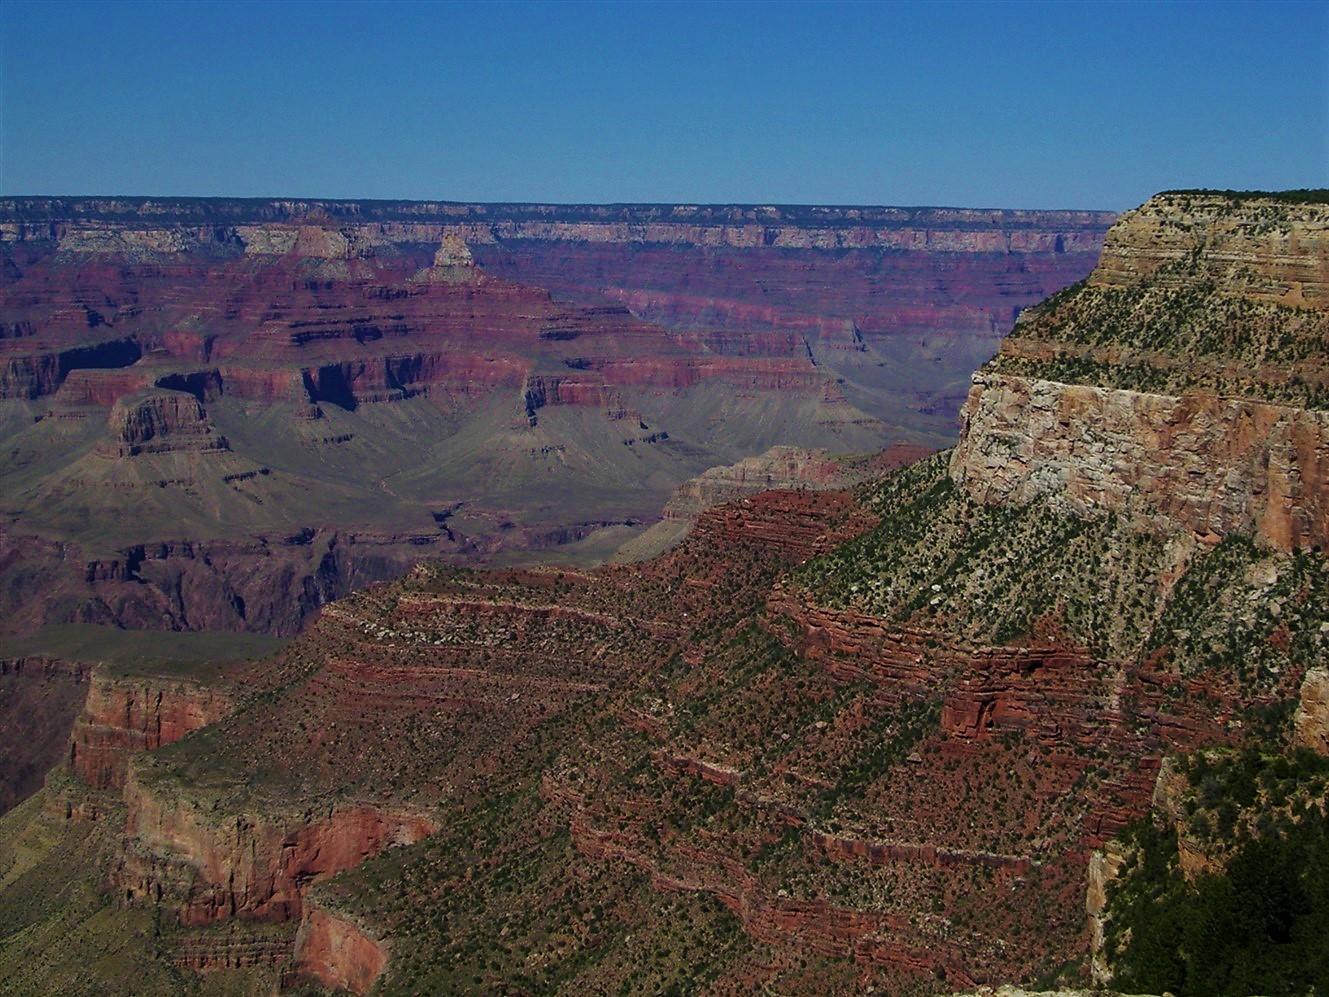 2005 06 26 Grand Canyon 31.jpg